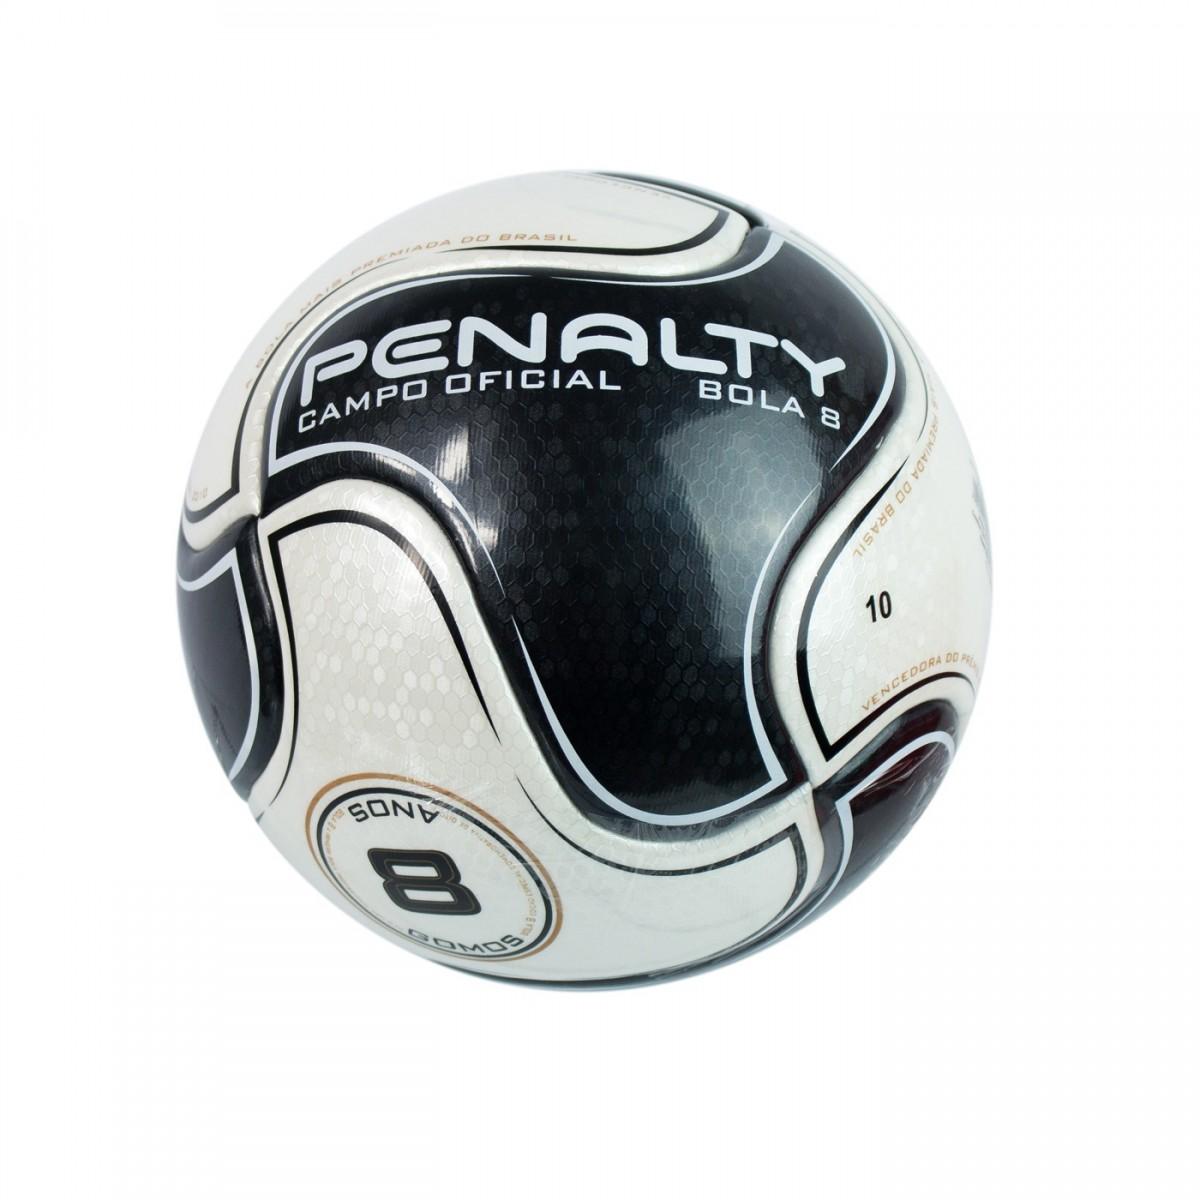 7fe4d0fb7911d Bizz Store - Bola Futebol de Campo Penalty S11 R1 Branco Preto